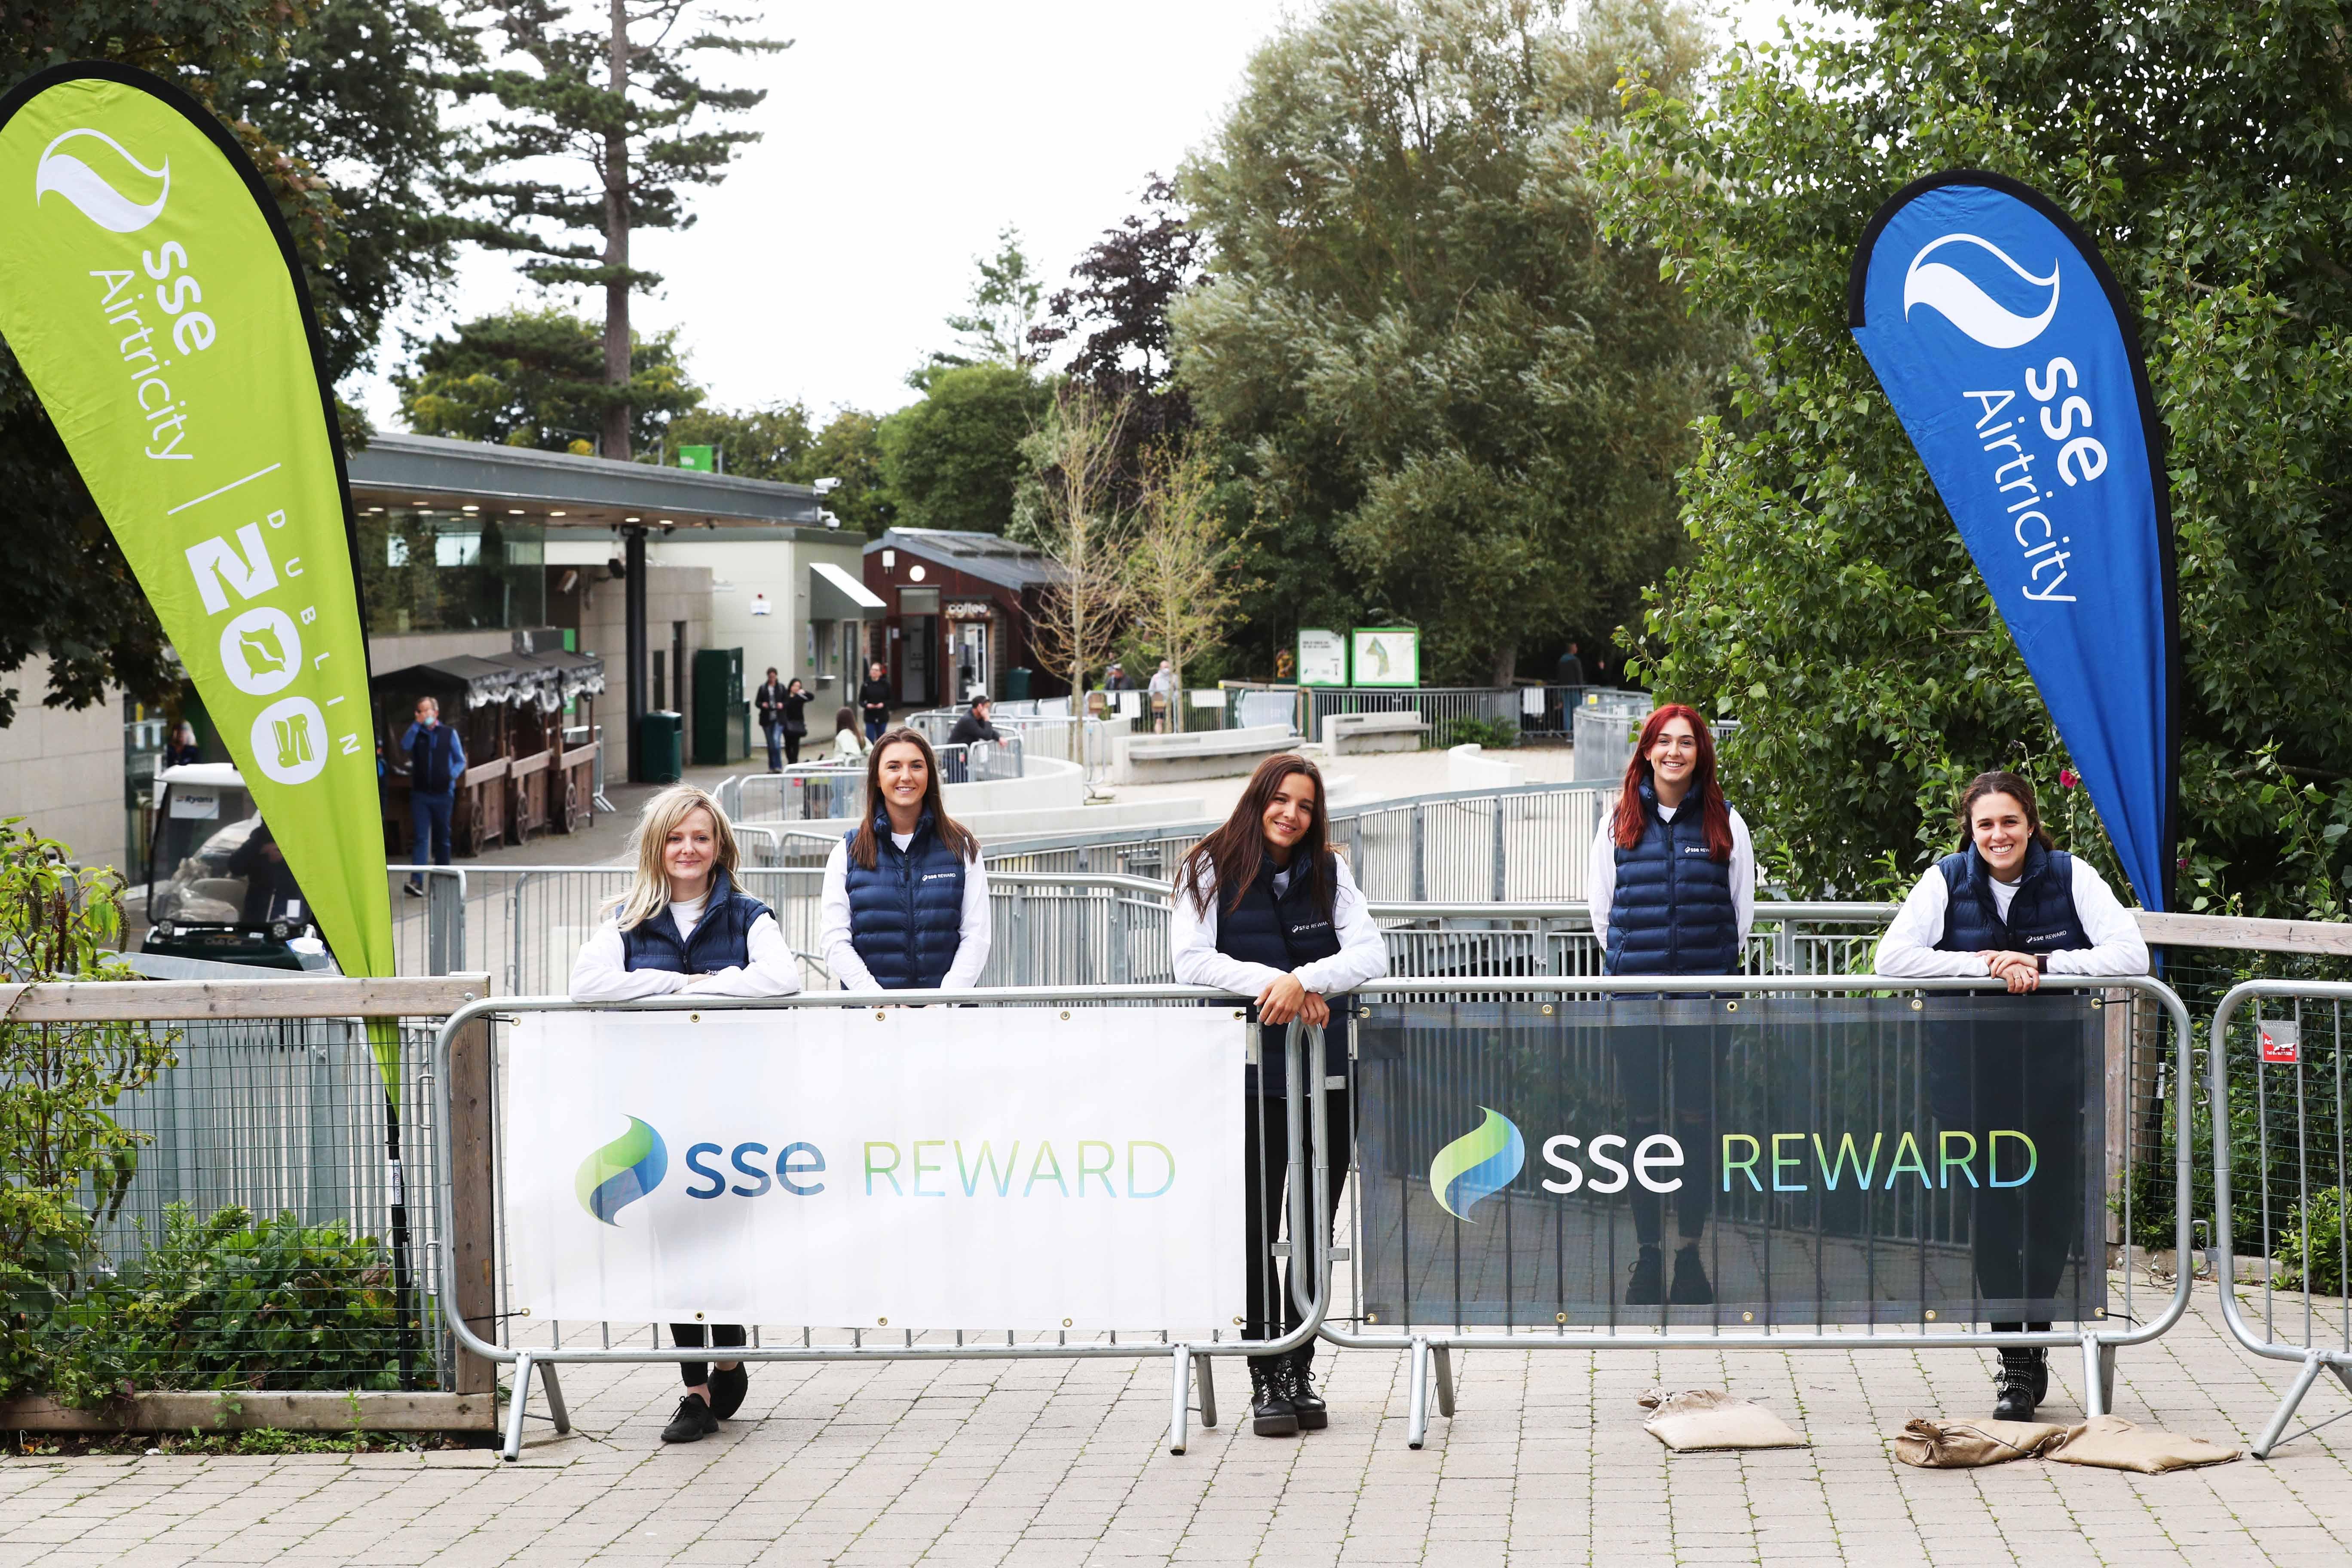 Ripple Marketing Agency Covid 19 Event Activation Dublin Zoo